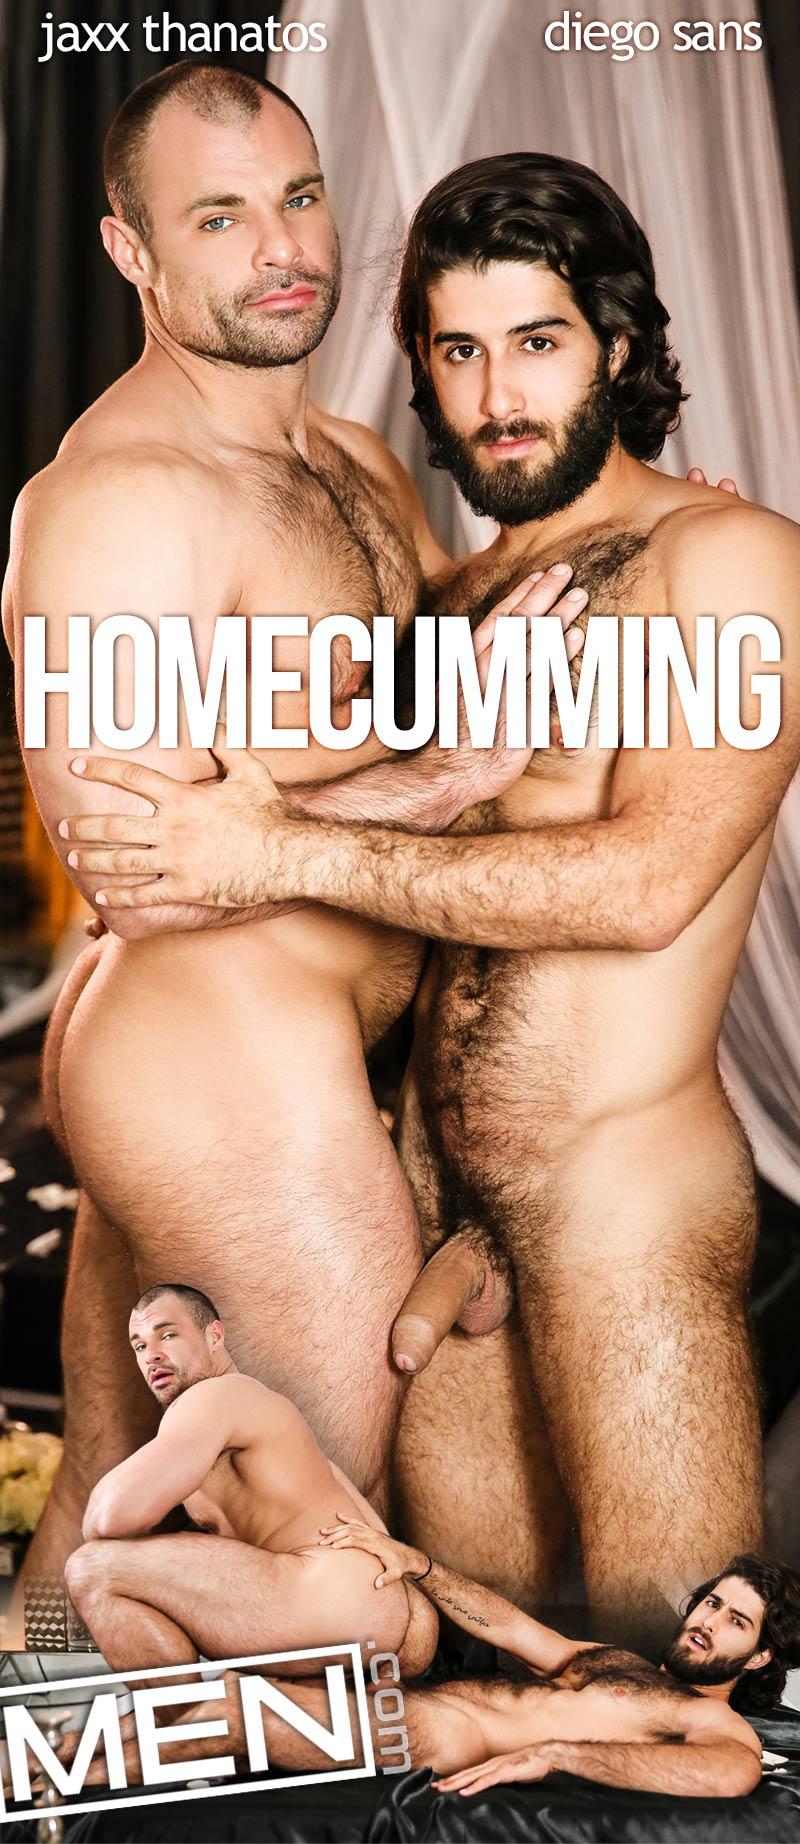 HomeCumming (Diego Sans Fucks Jaxx Thanatos) at Drill My Hole